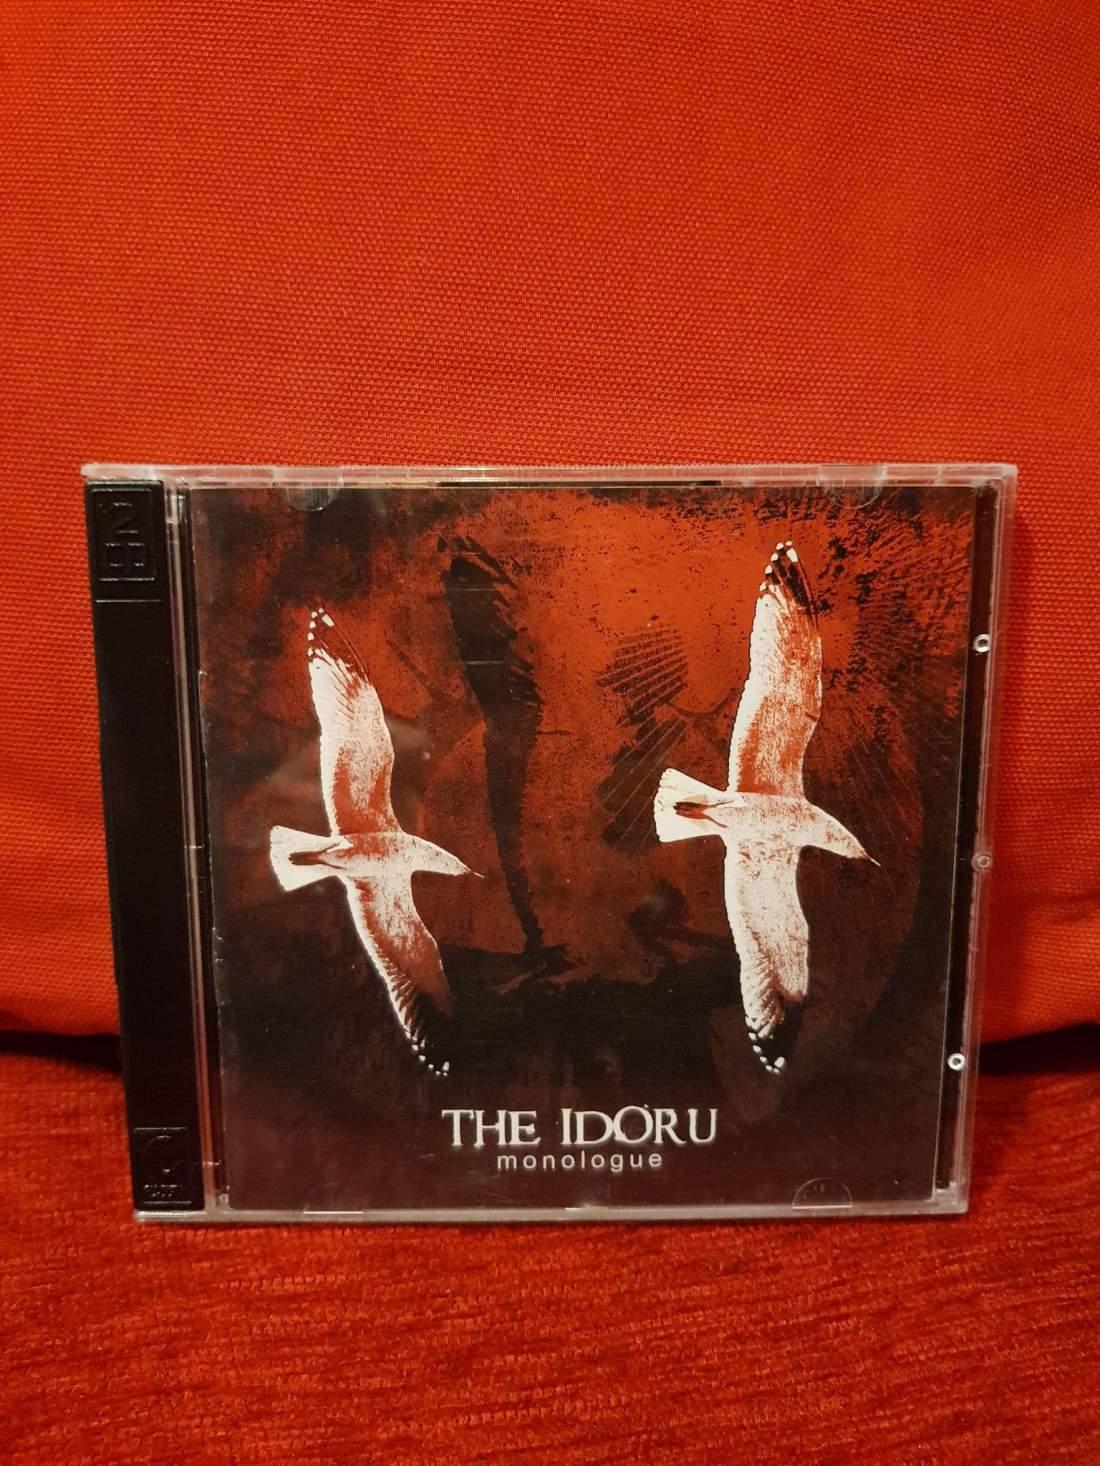 THE IDORU - MONOLOGUE CD